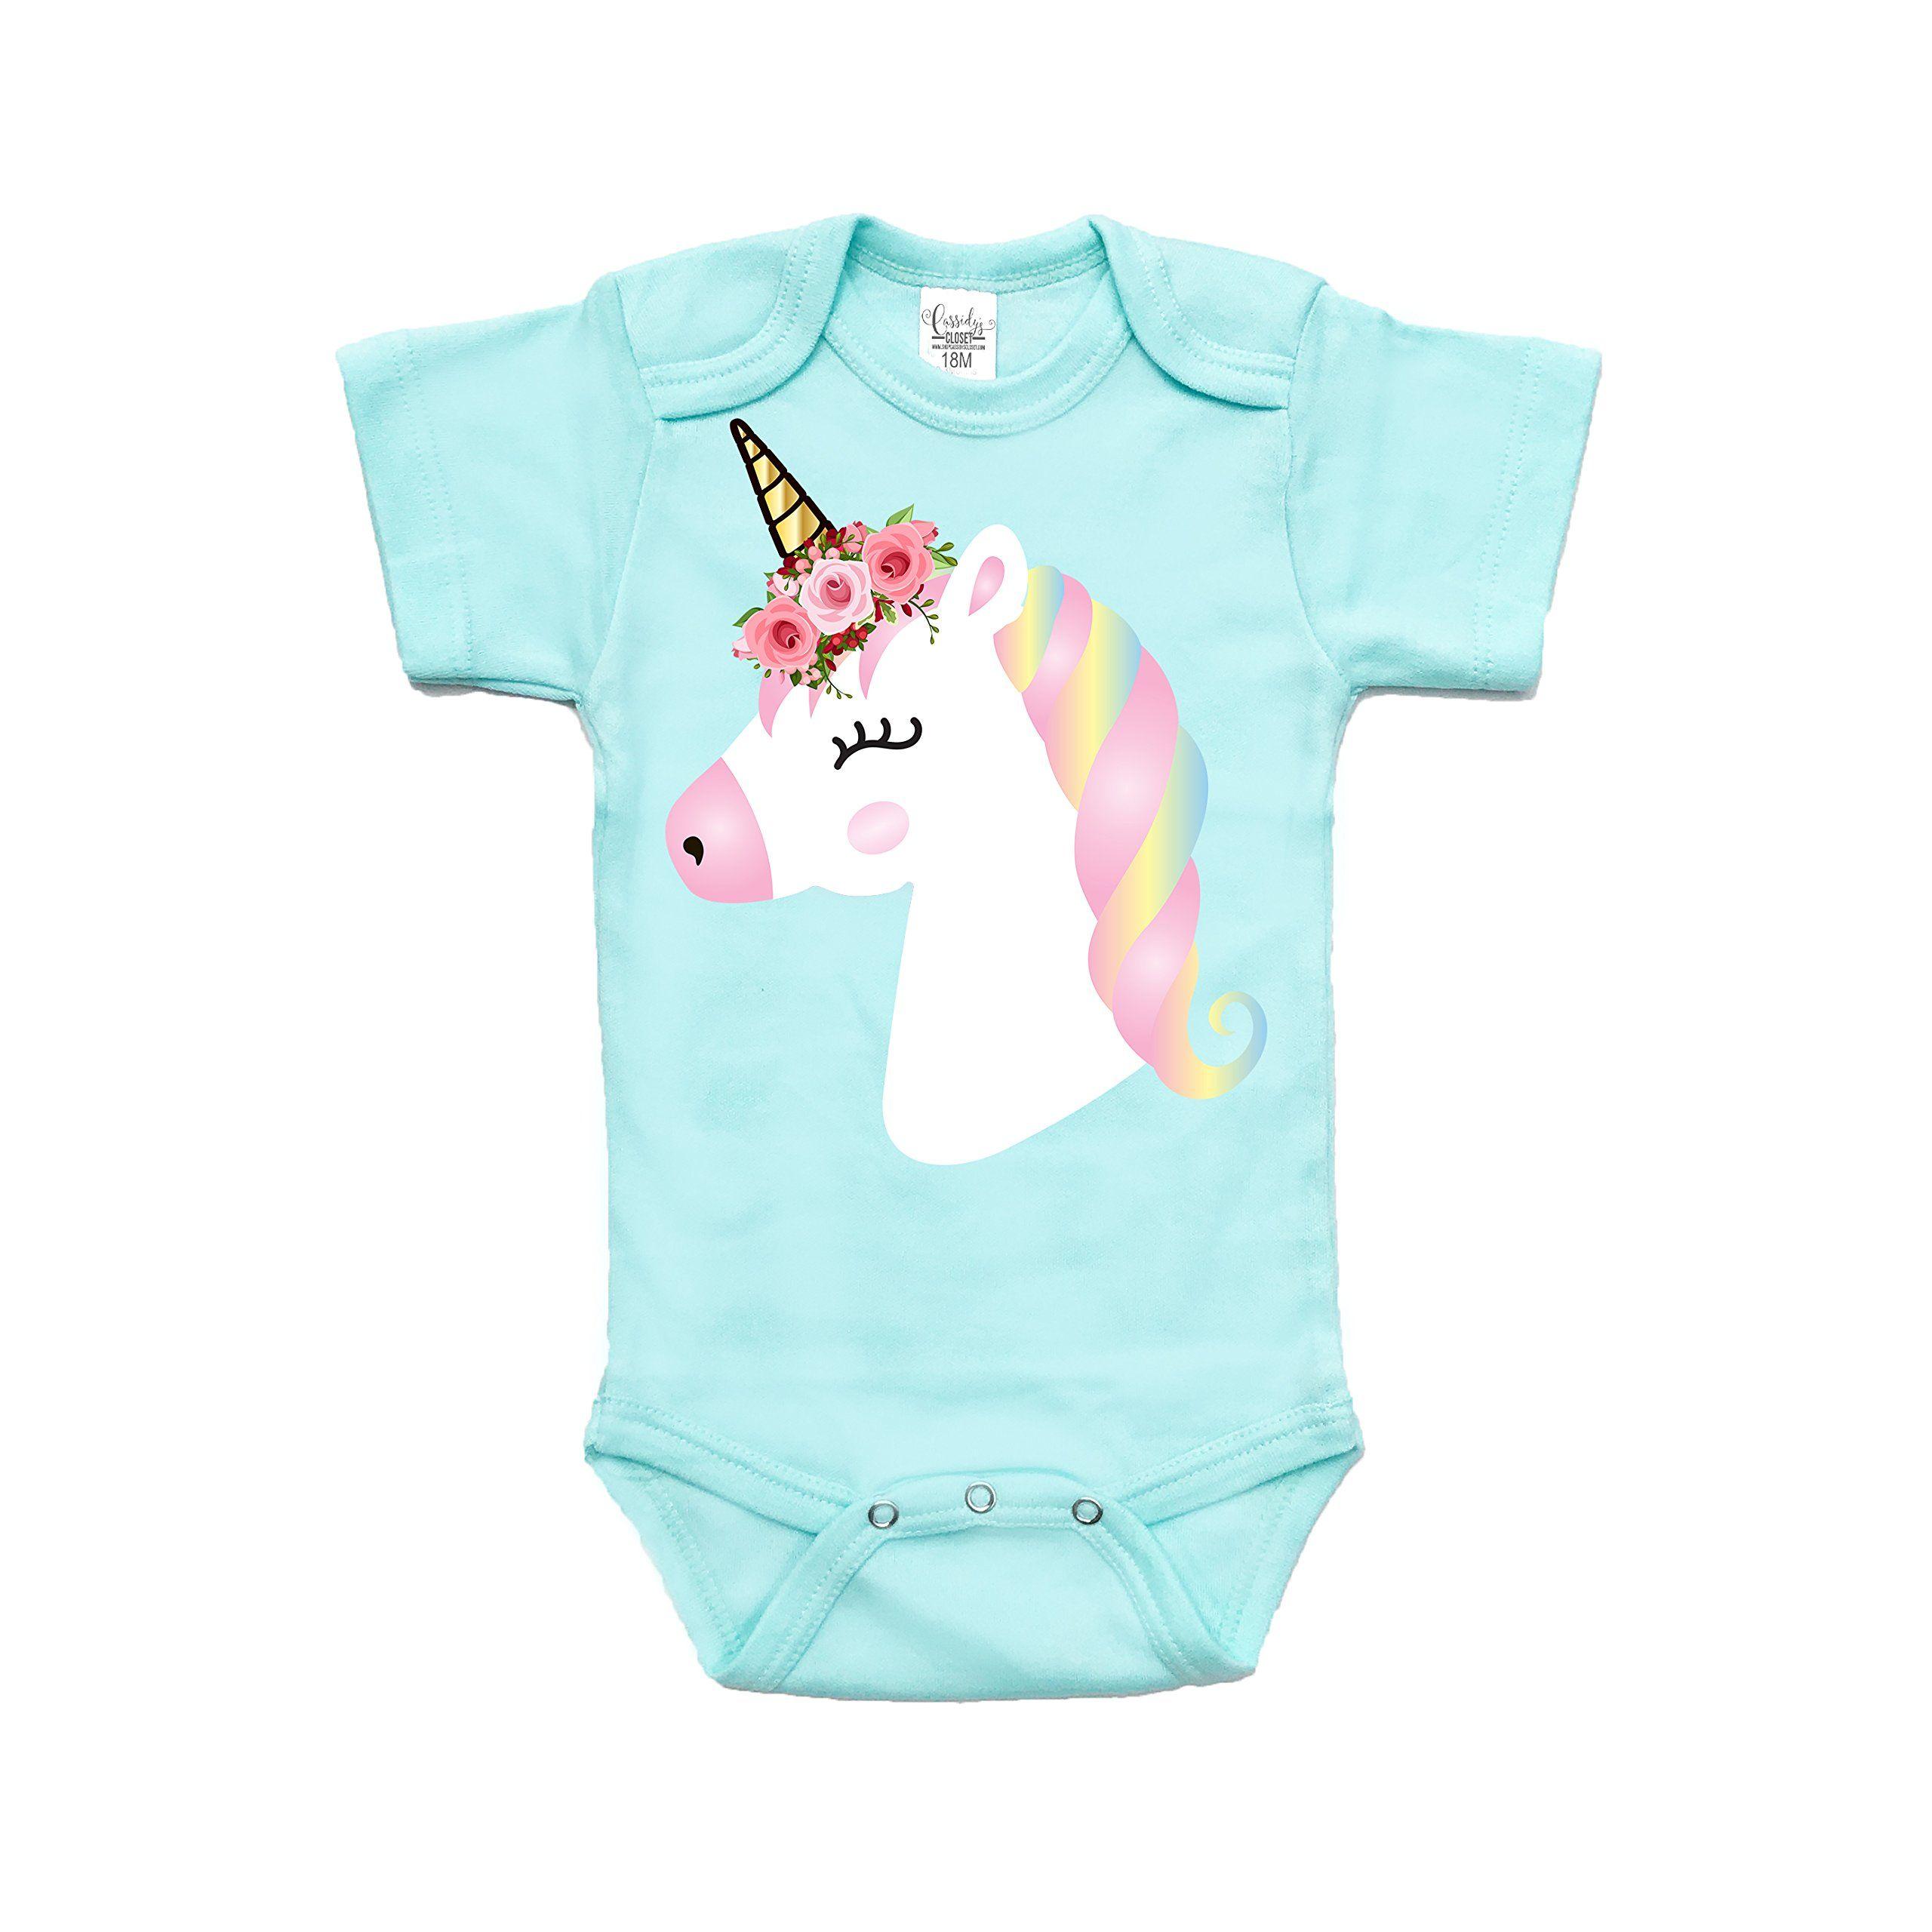 Cute Baby Girl Unicorn Bodysuit Usa Made Non Toxic, Baby Safe